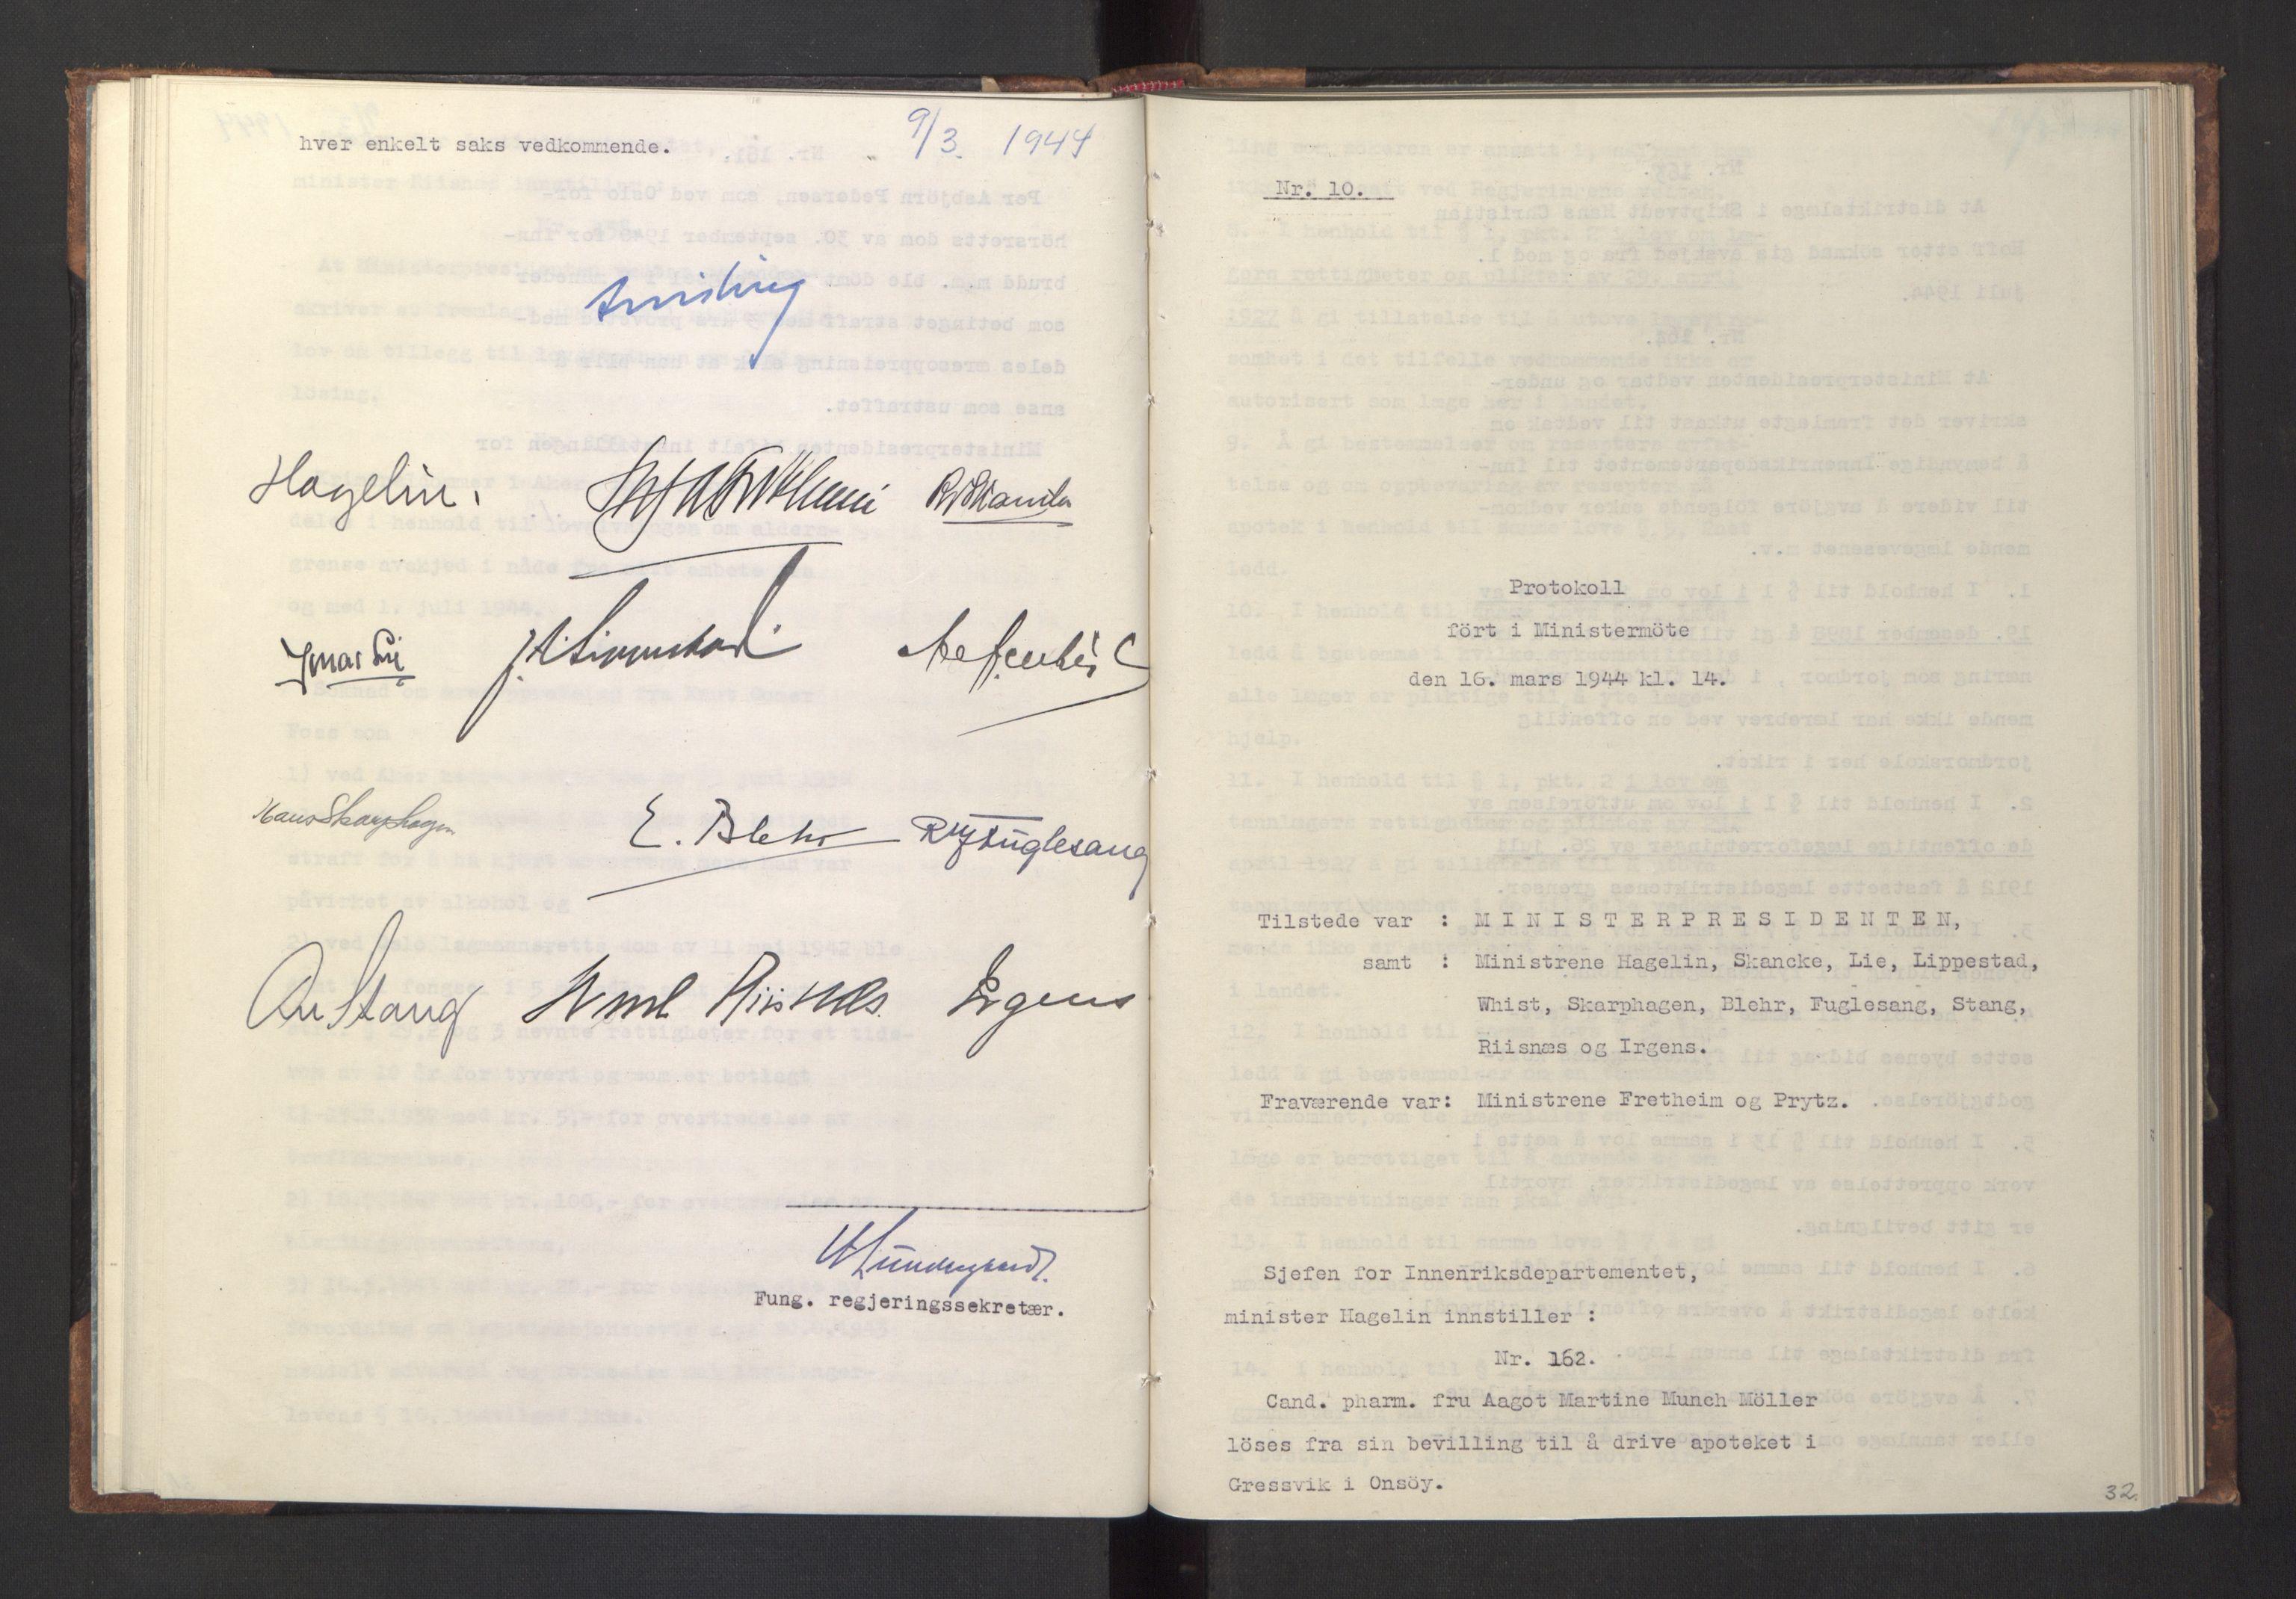 RA, NS-administrasjonen 1940-1945 (Statsrådsekretariatet, de kommisariske statsråder mm), D/Da/L0005: Protokoll fra ministermøter, 1944, s. 31b-32a